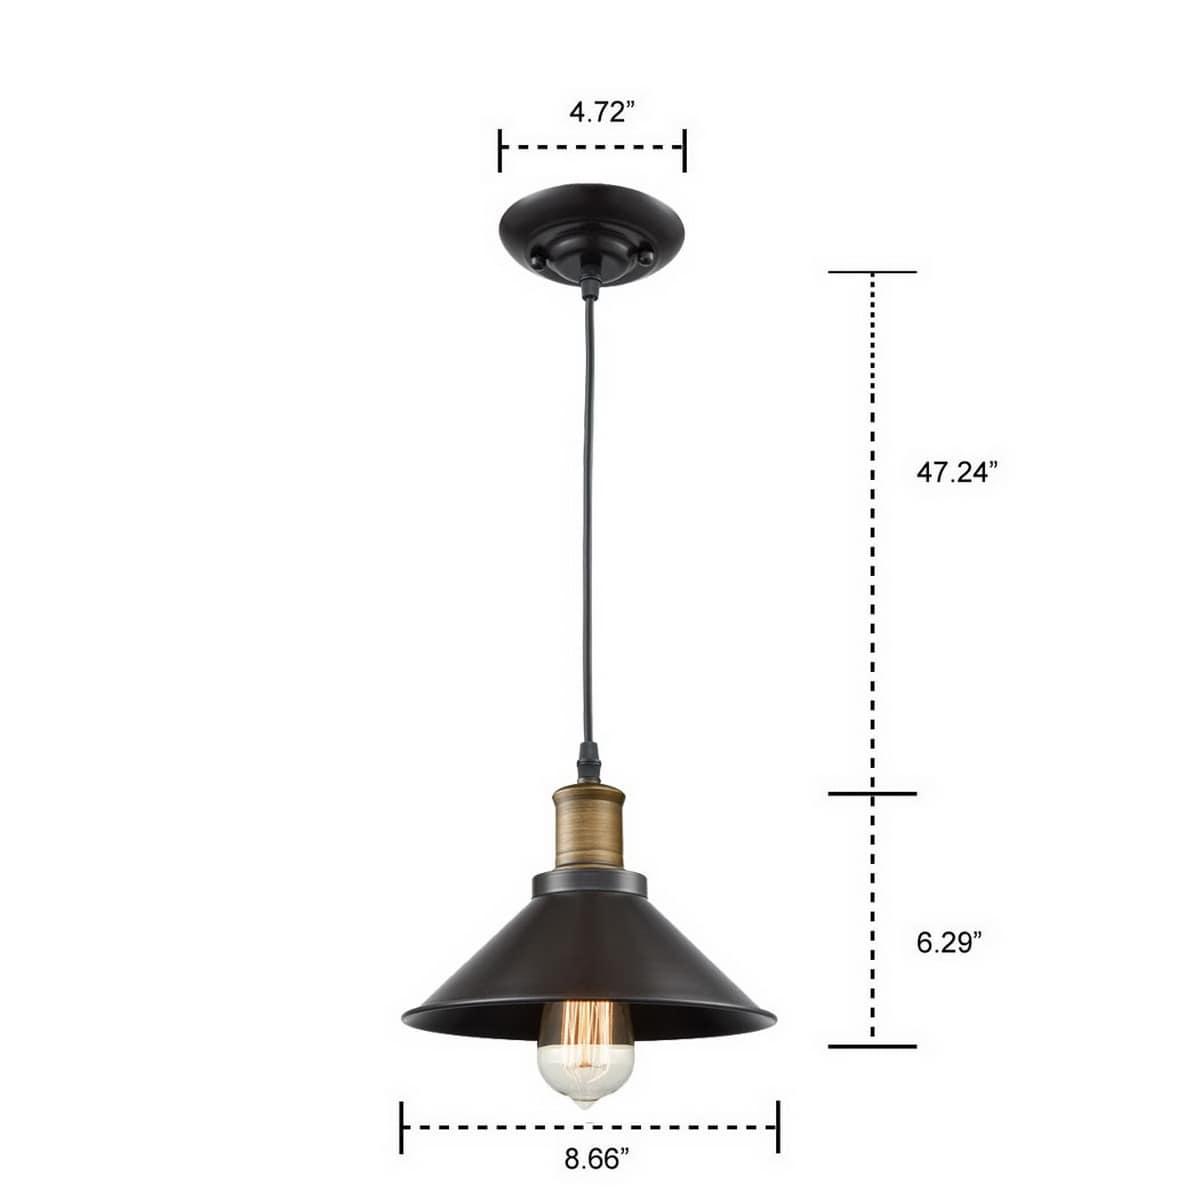 Industrial Bronze Pendant Light 3 Pack mini Loft Fixture